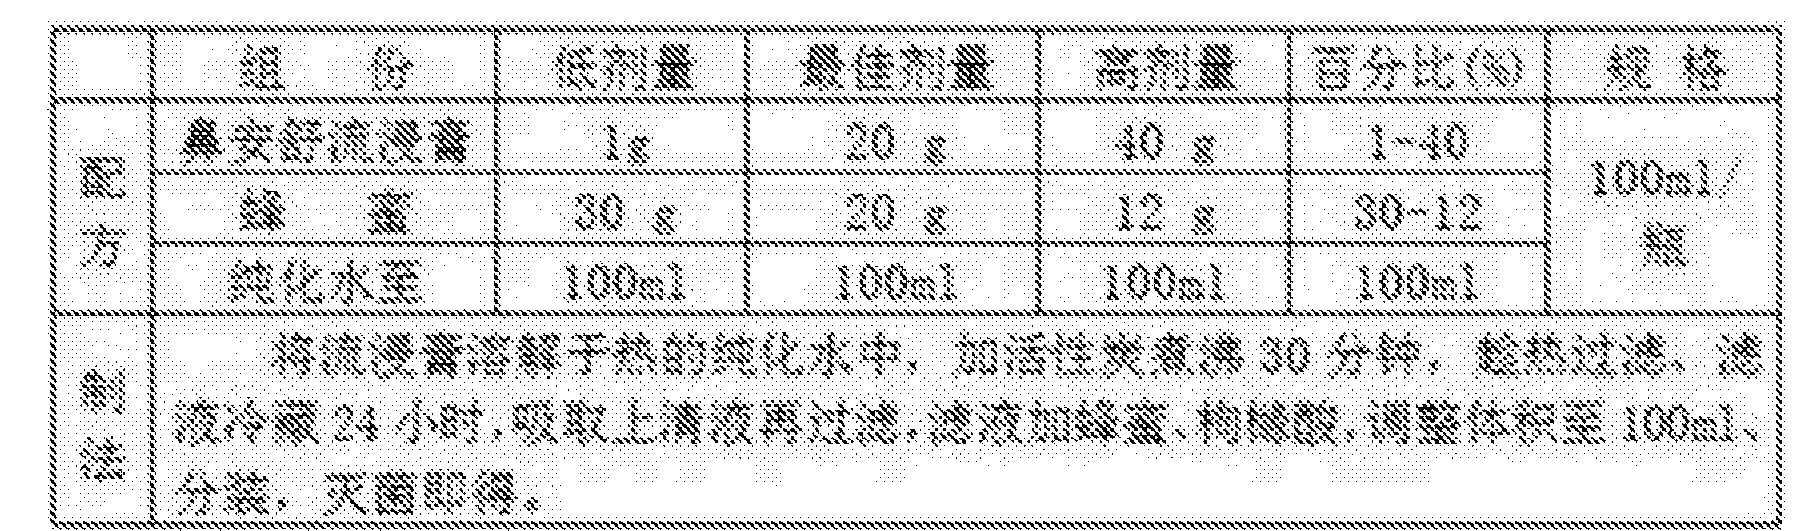 Figure CN107638448AD00122